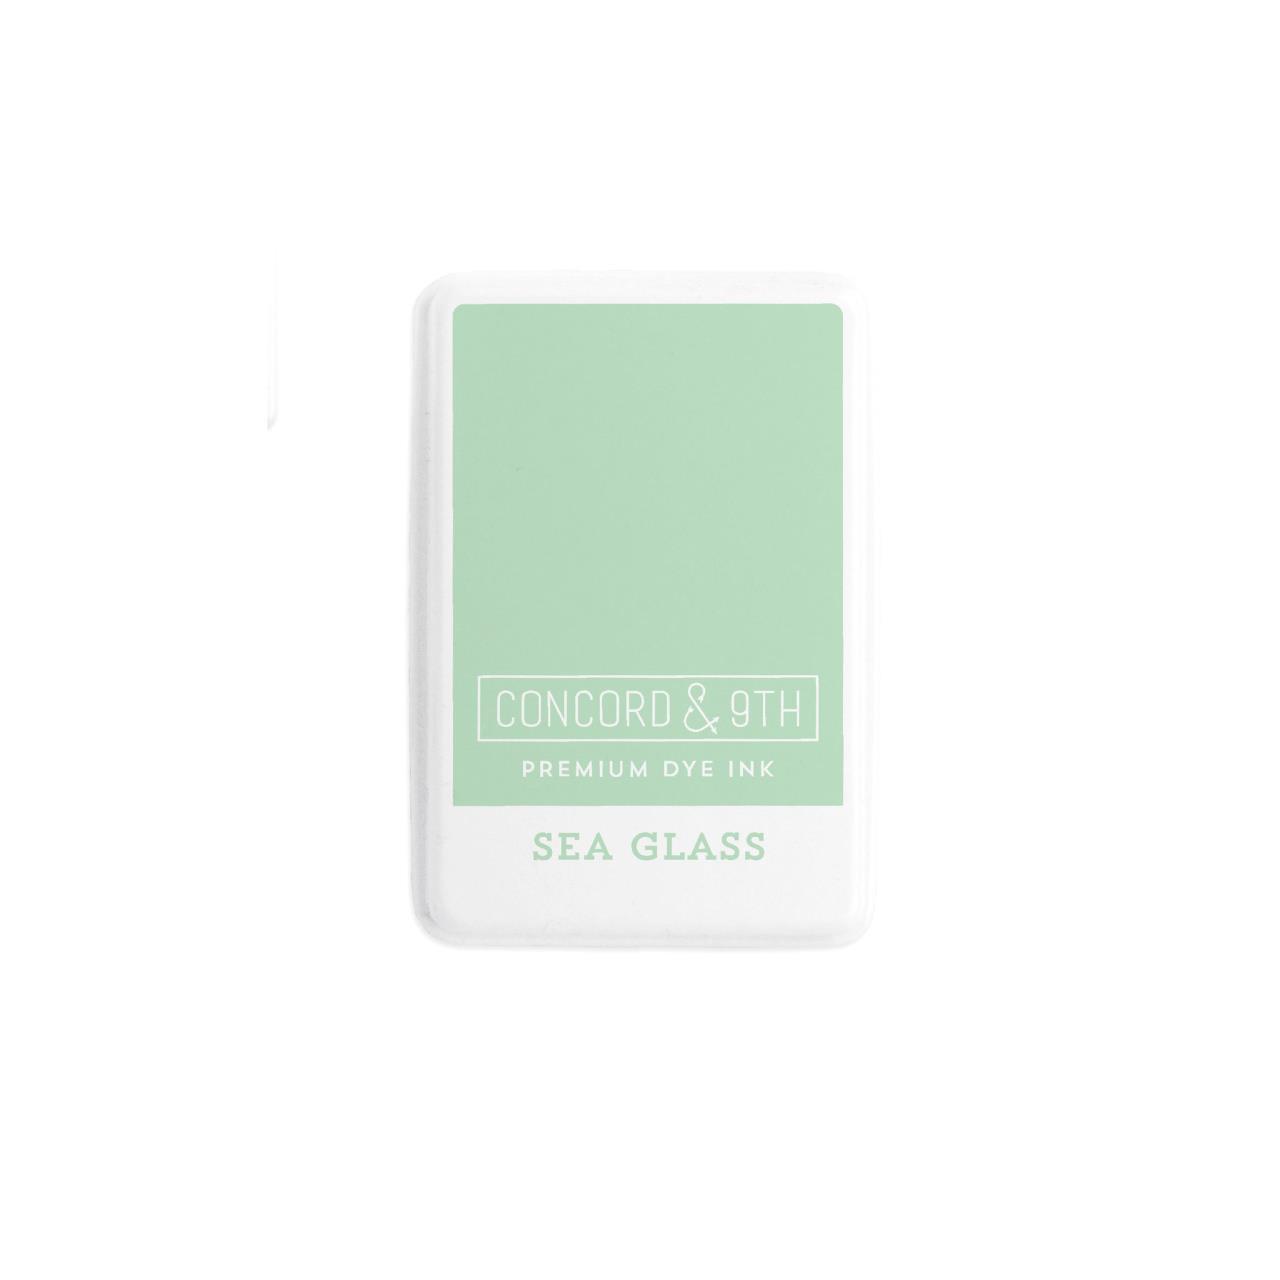 Sea Glass, Concord & 9th Premium Dye Ink Pads - 090222402027